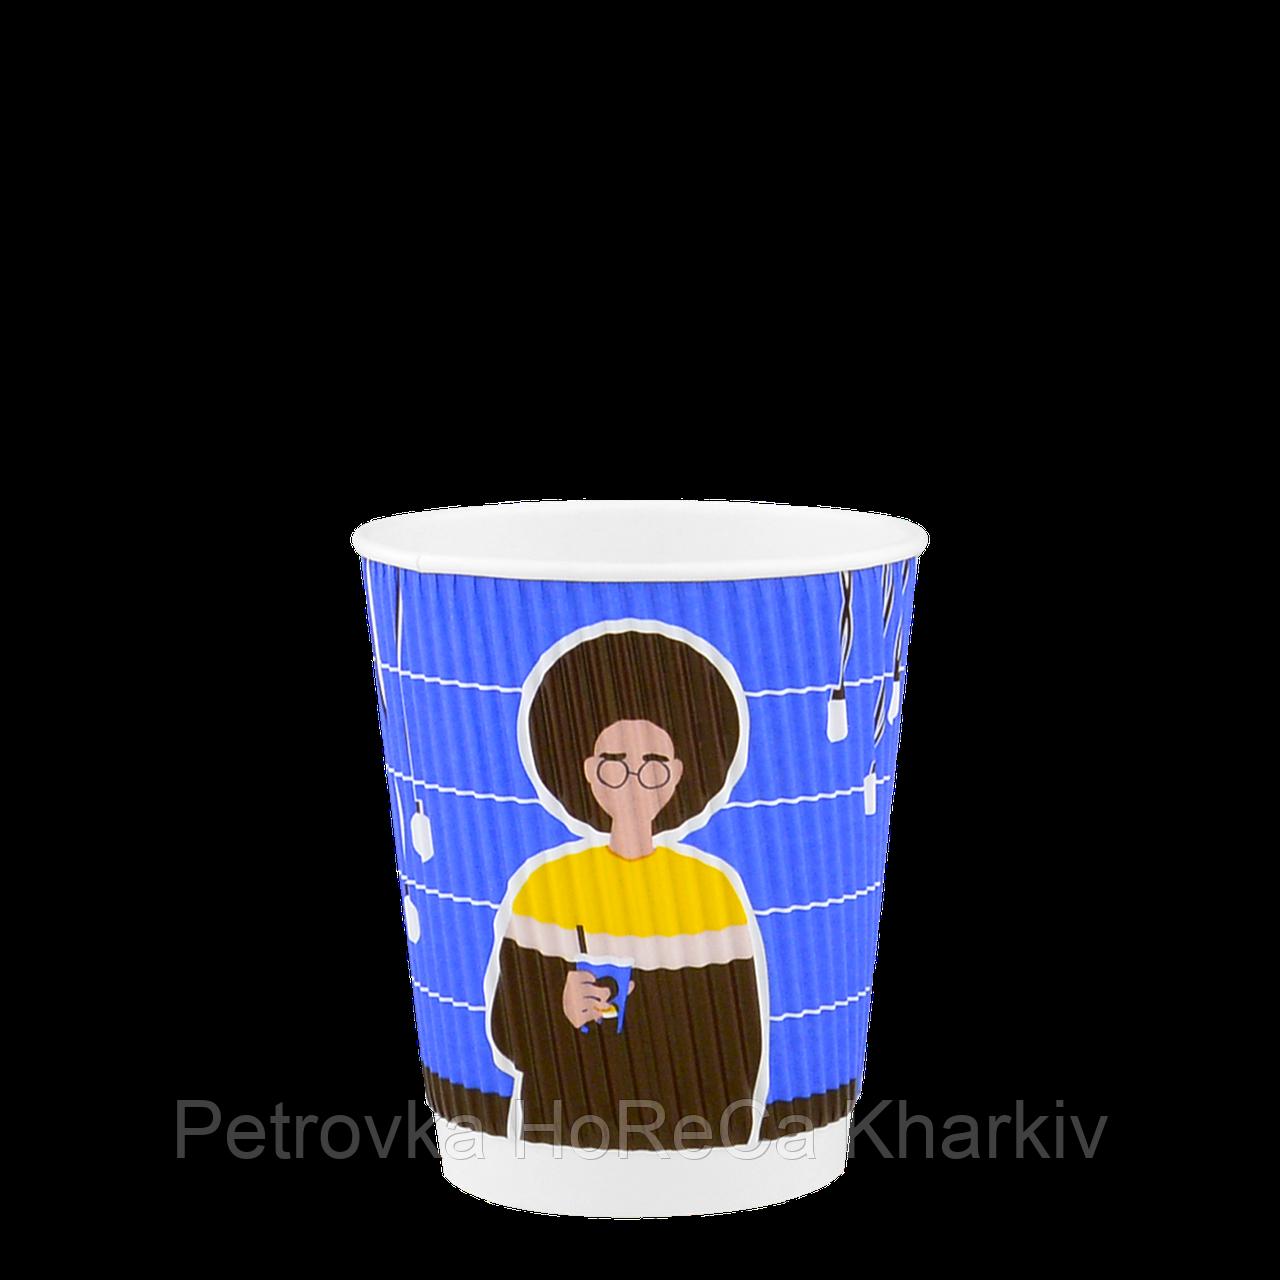 Стакан гофрированный COFFEEFRIENDS 250мл. Евро 30шт/рук; 28рук/ящ; 840шт/ящ, (КВ80/FiB80)